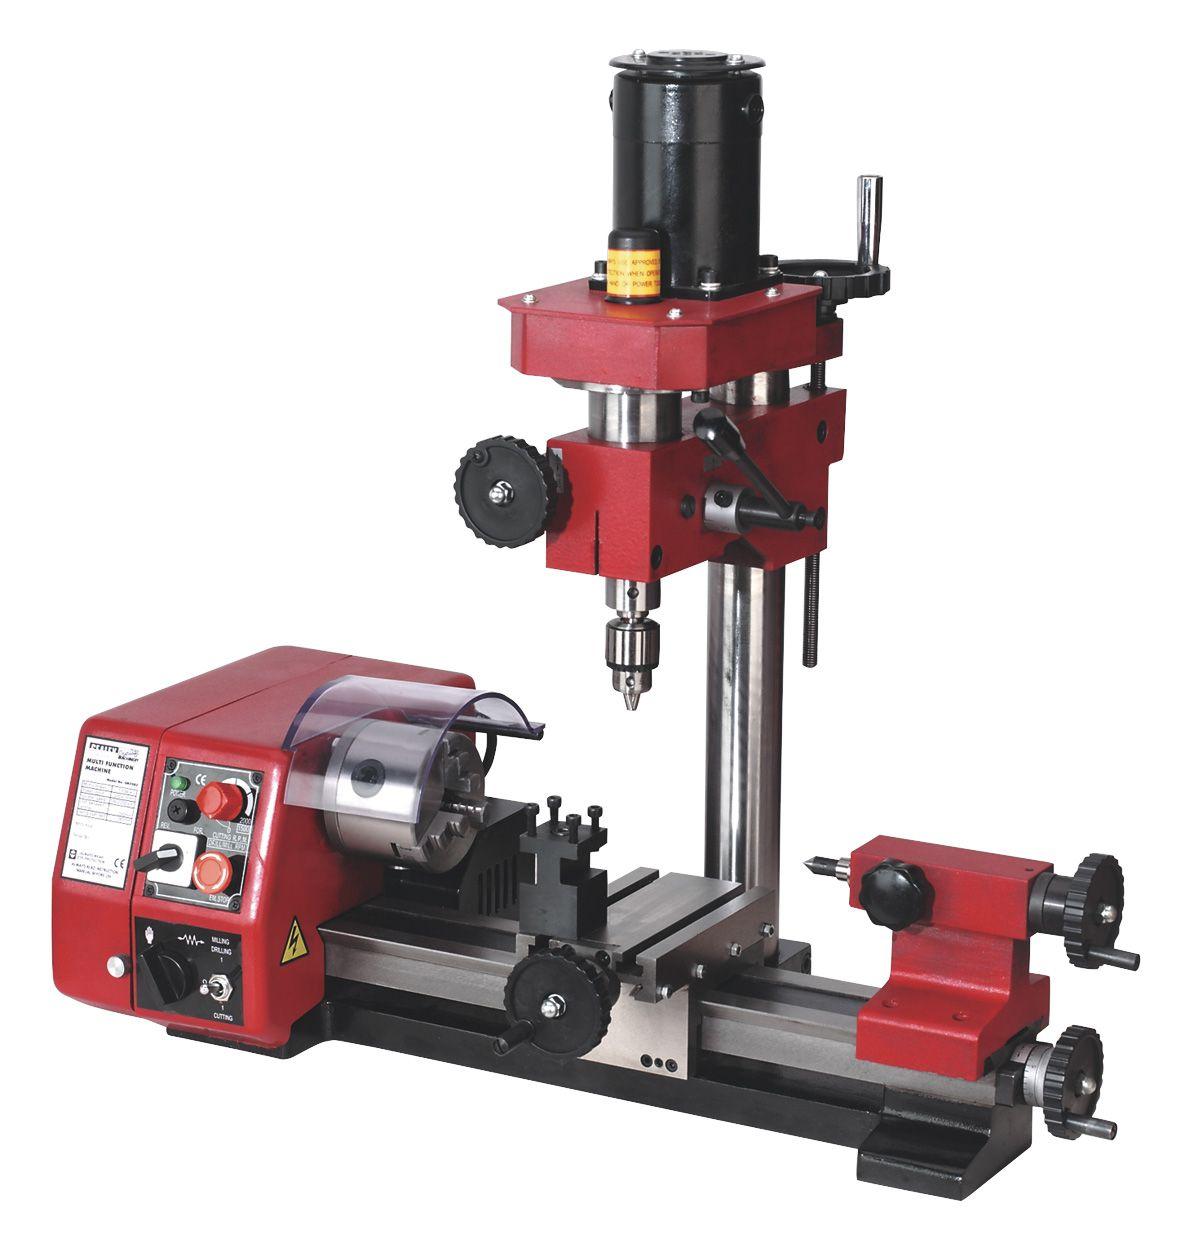 Sealey Mini Lathe & Drilling Machine